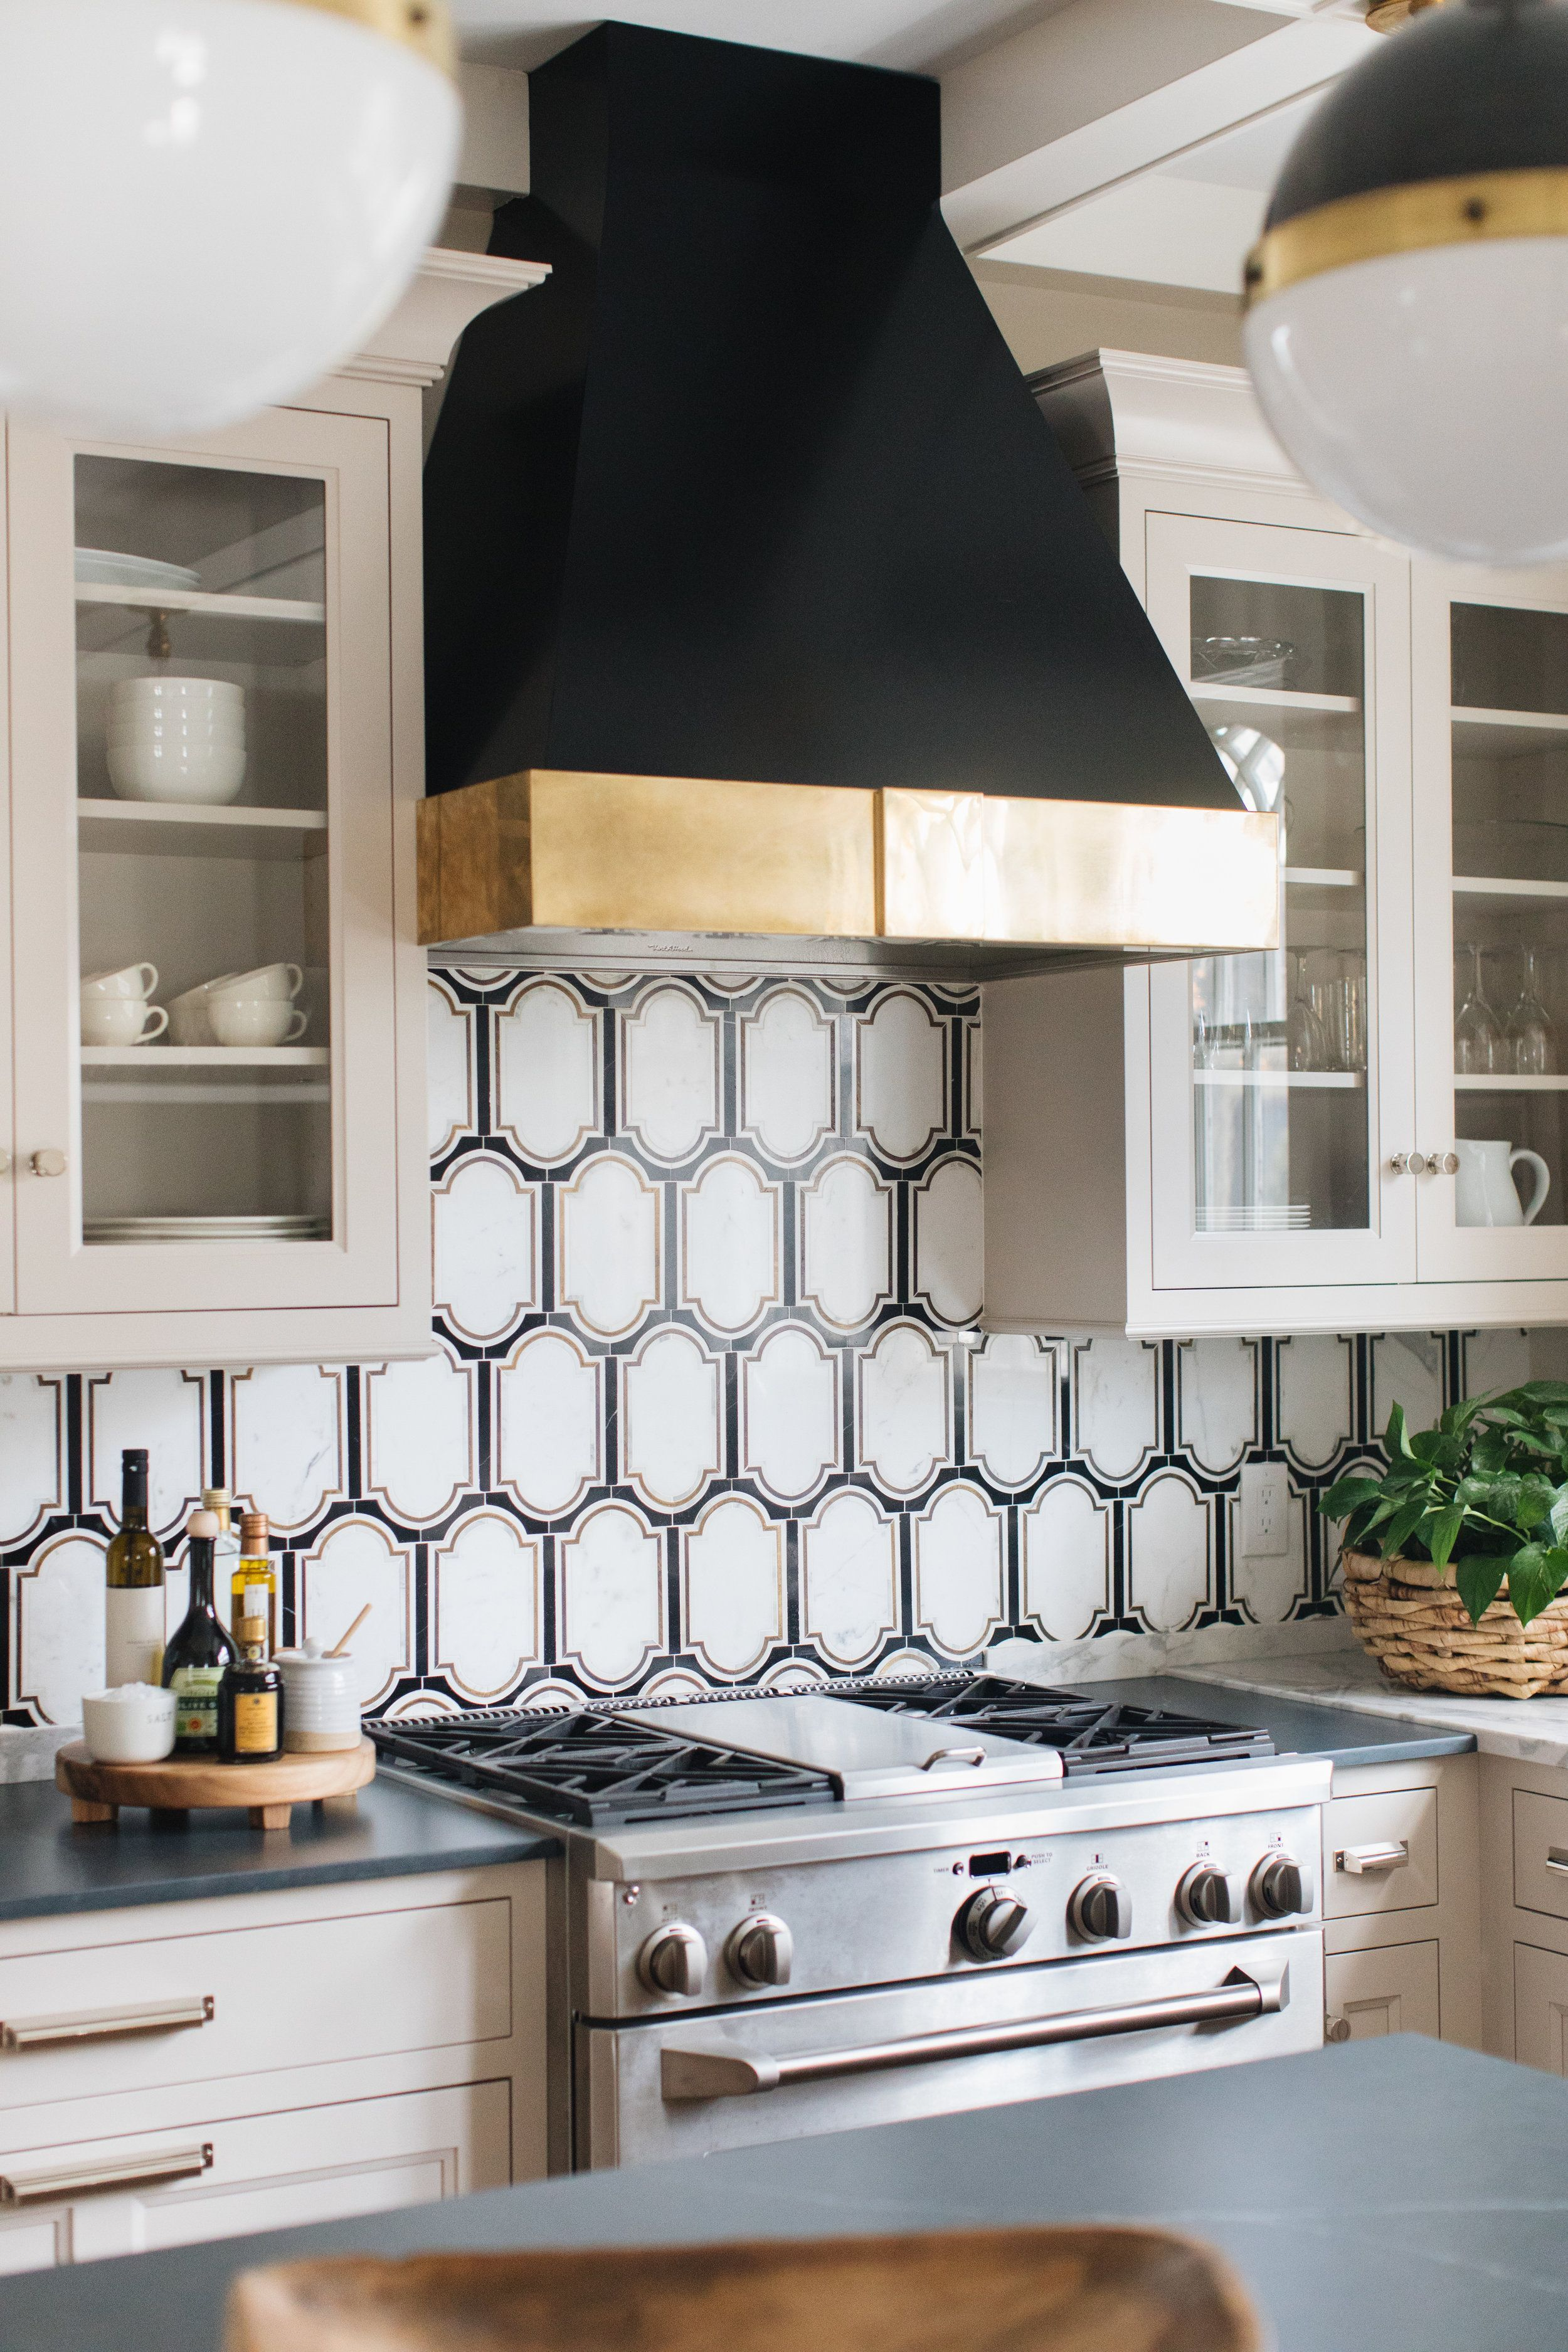 - 47+ Old Fashioned Backsplash Tiles Illustration Geometric